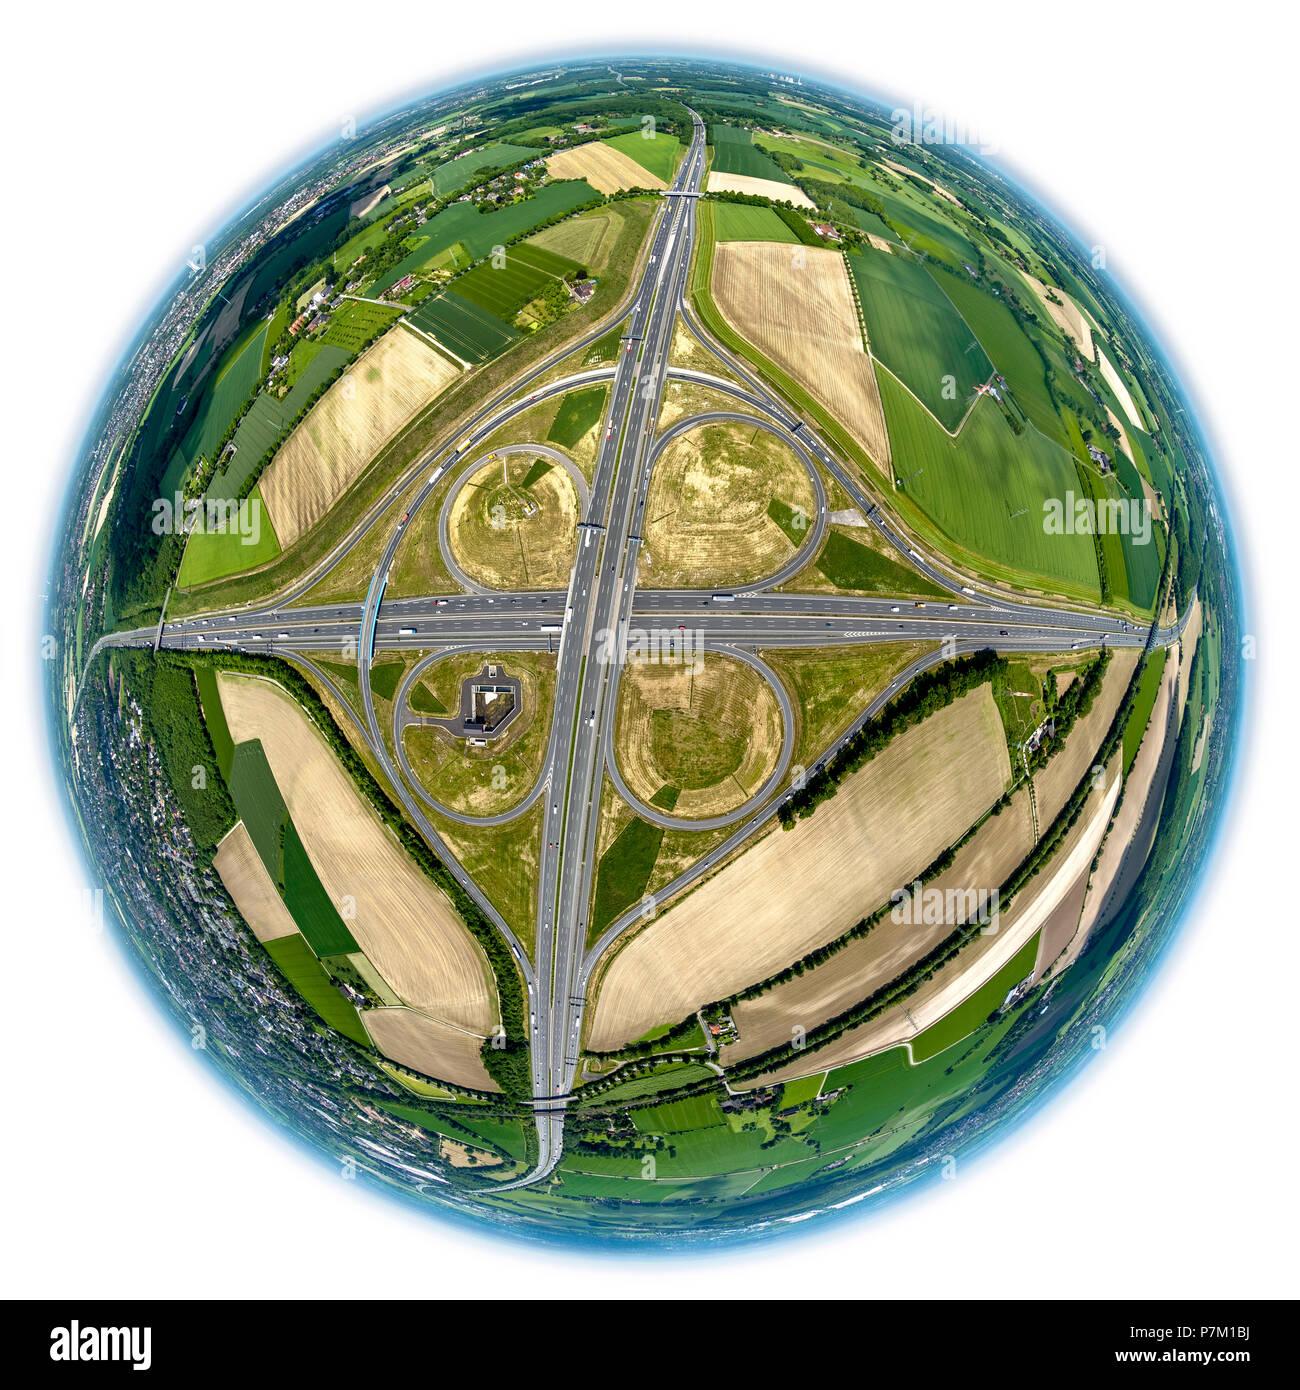 Fisheye lens, view of Kamener Kreuz interchange, A2 and A1 German Autobahnen (motorways), cloverleaf interchange, Kamen, Ruhr area, North Rhine-Westphalia, Germany - Stock Image